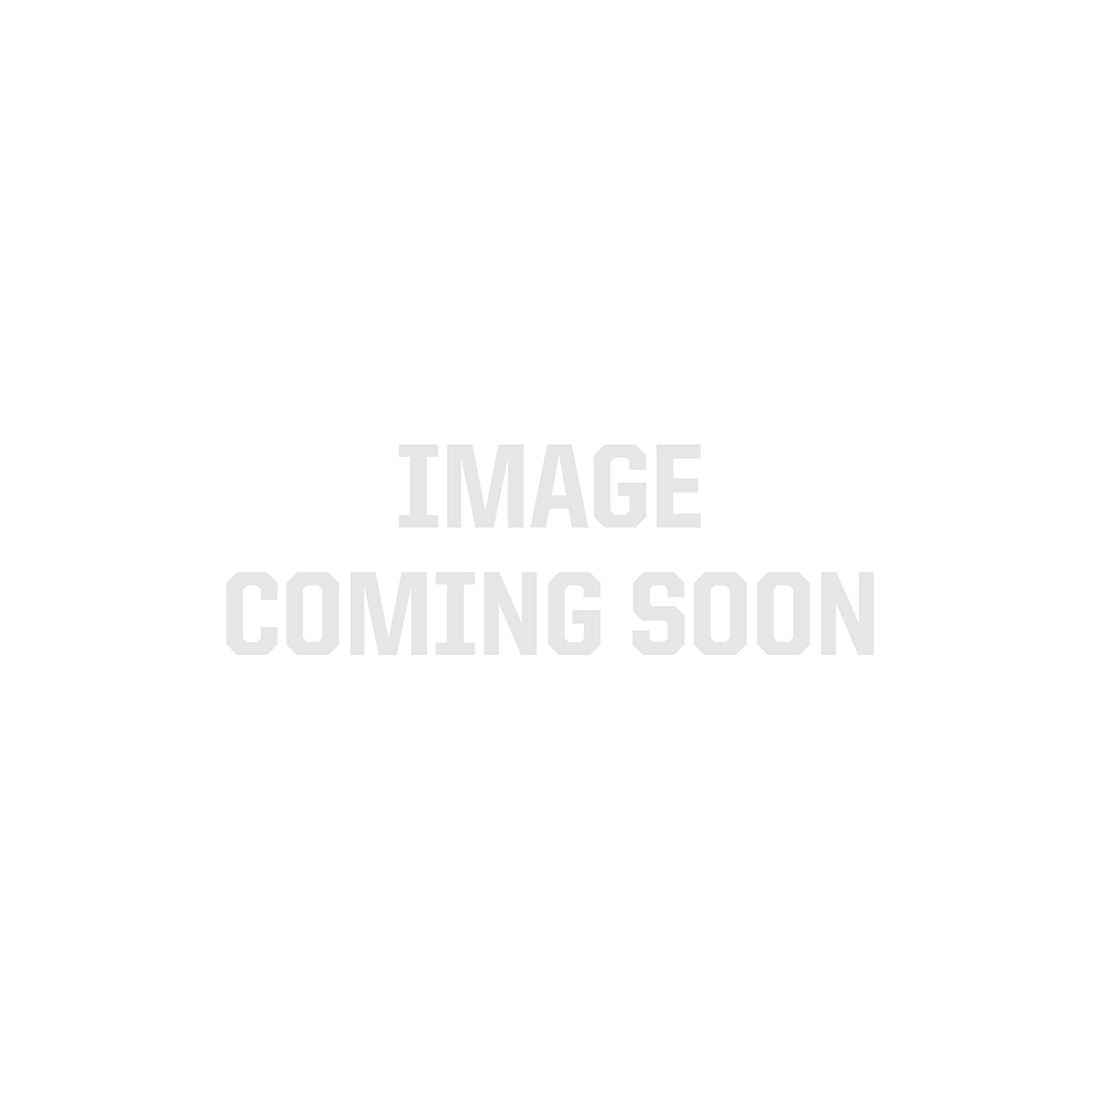 Raintight Intermatic P1121 Timer (3 prong plug) Heavy Duty